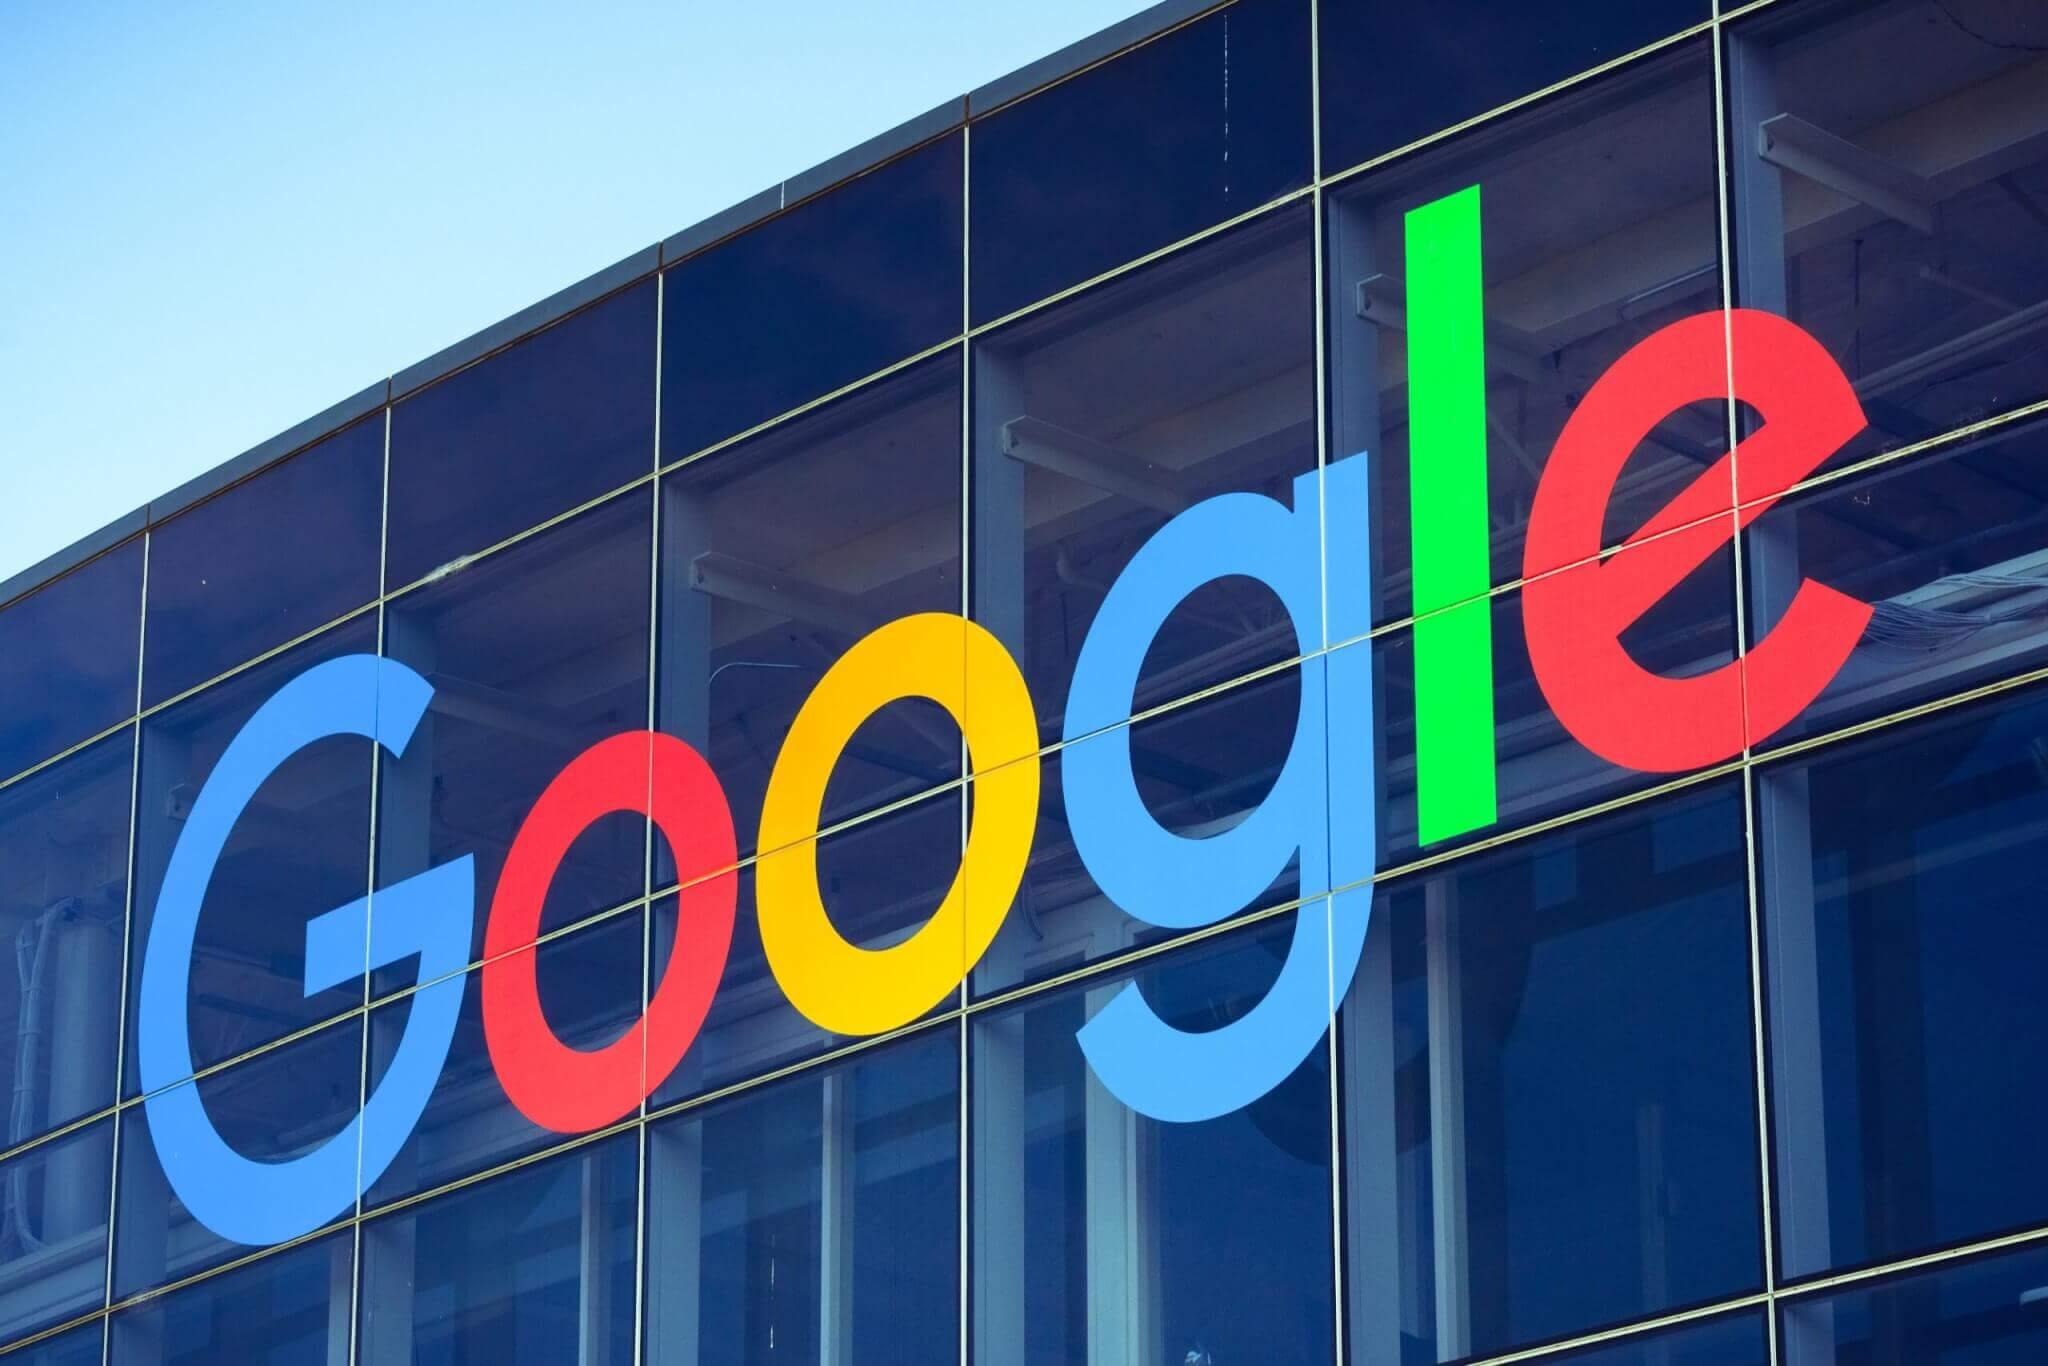 beyond the brand google